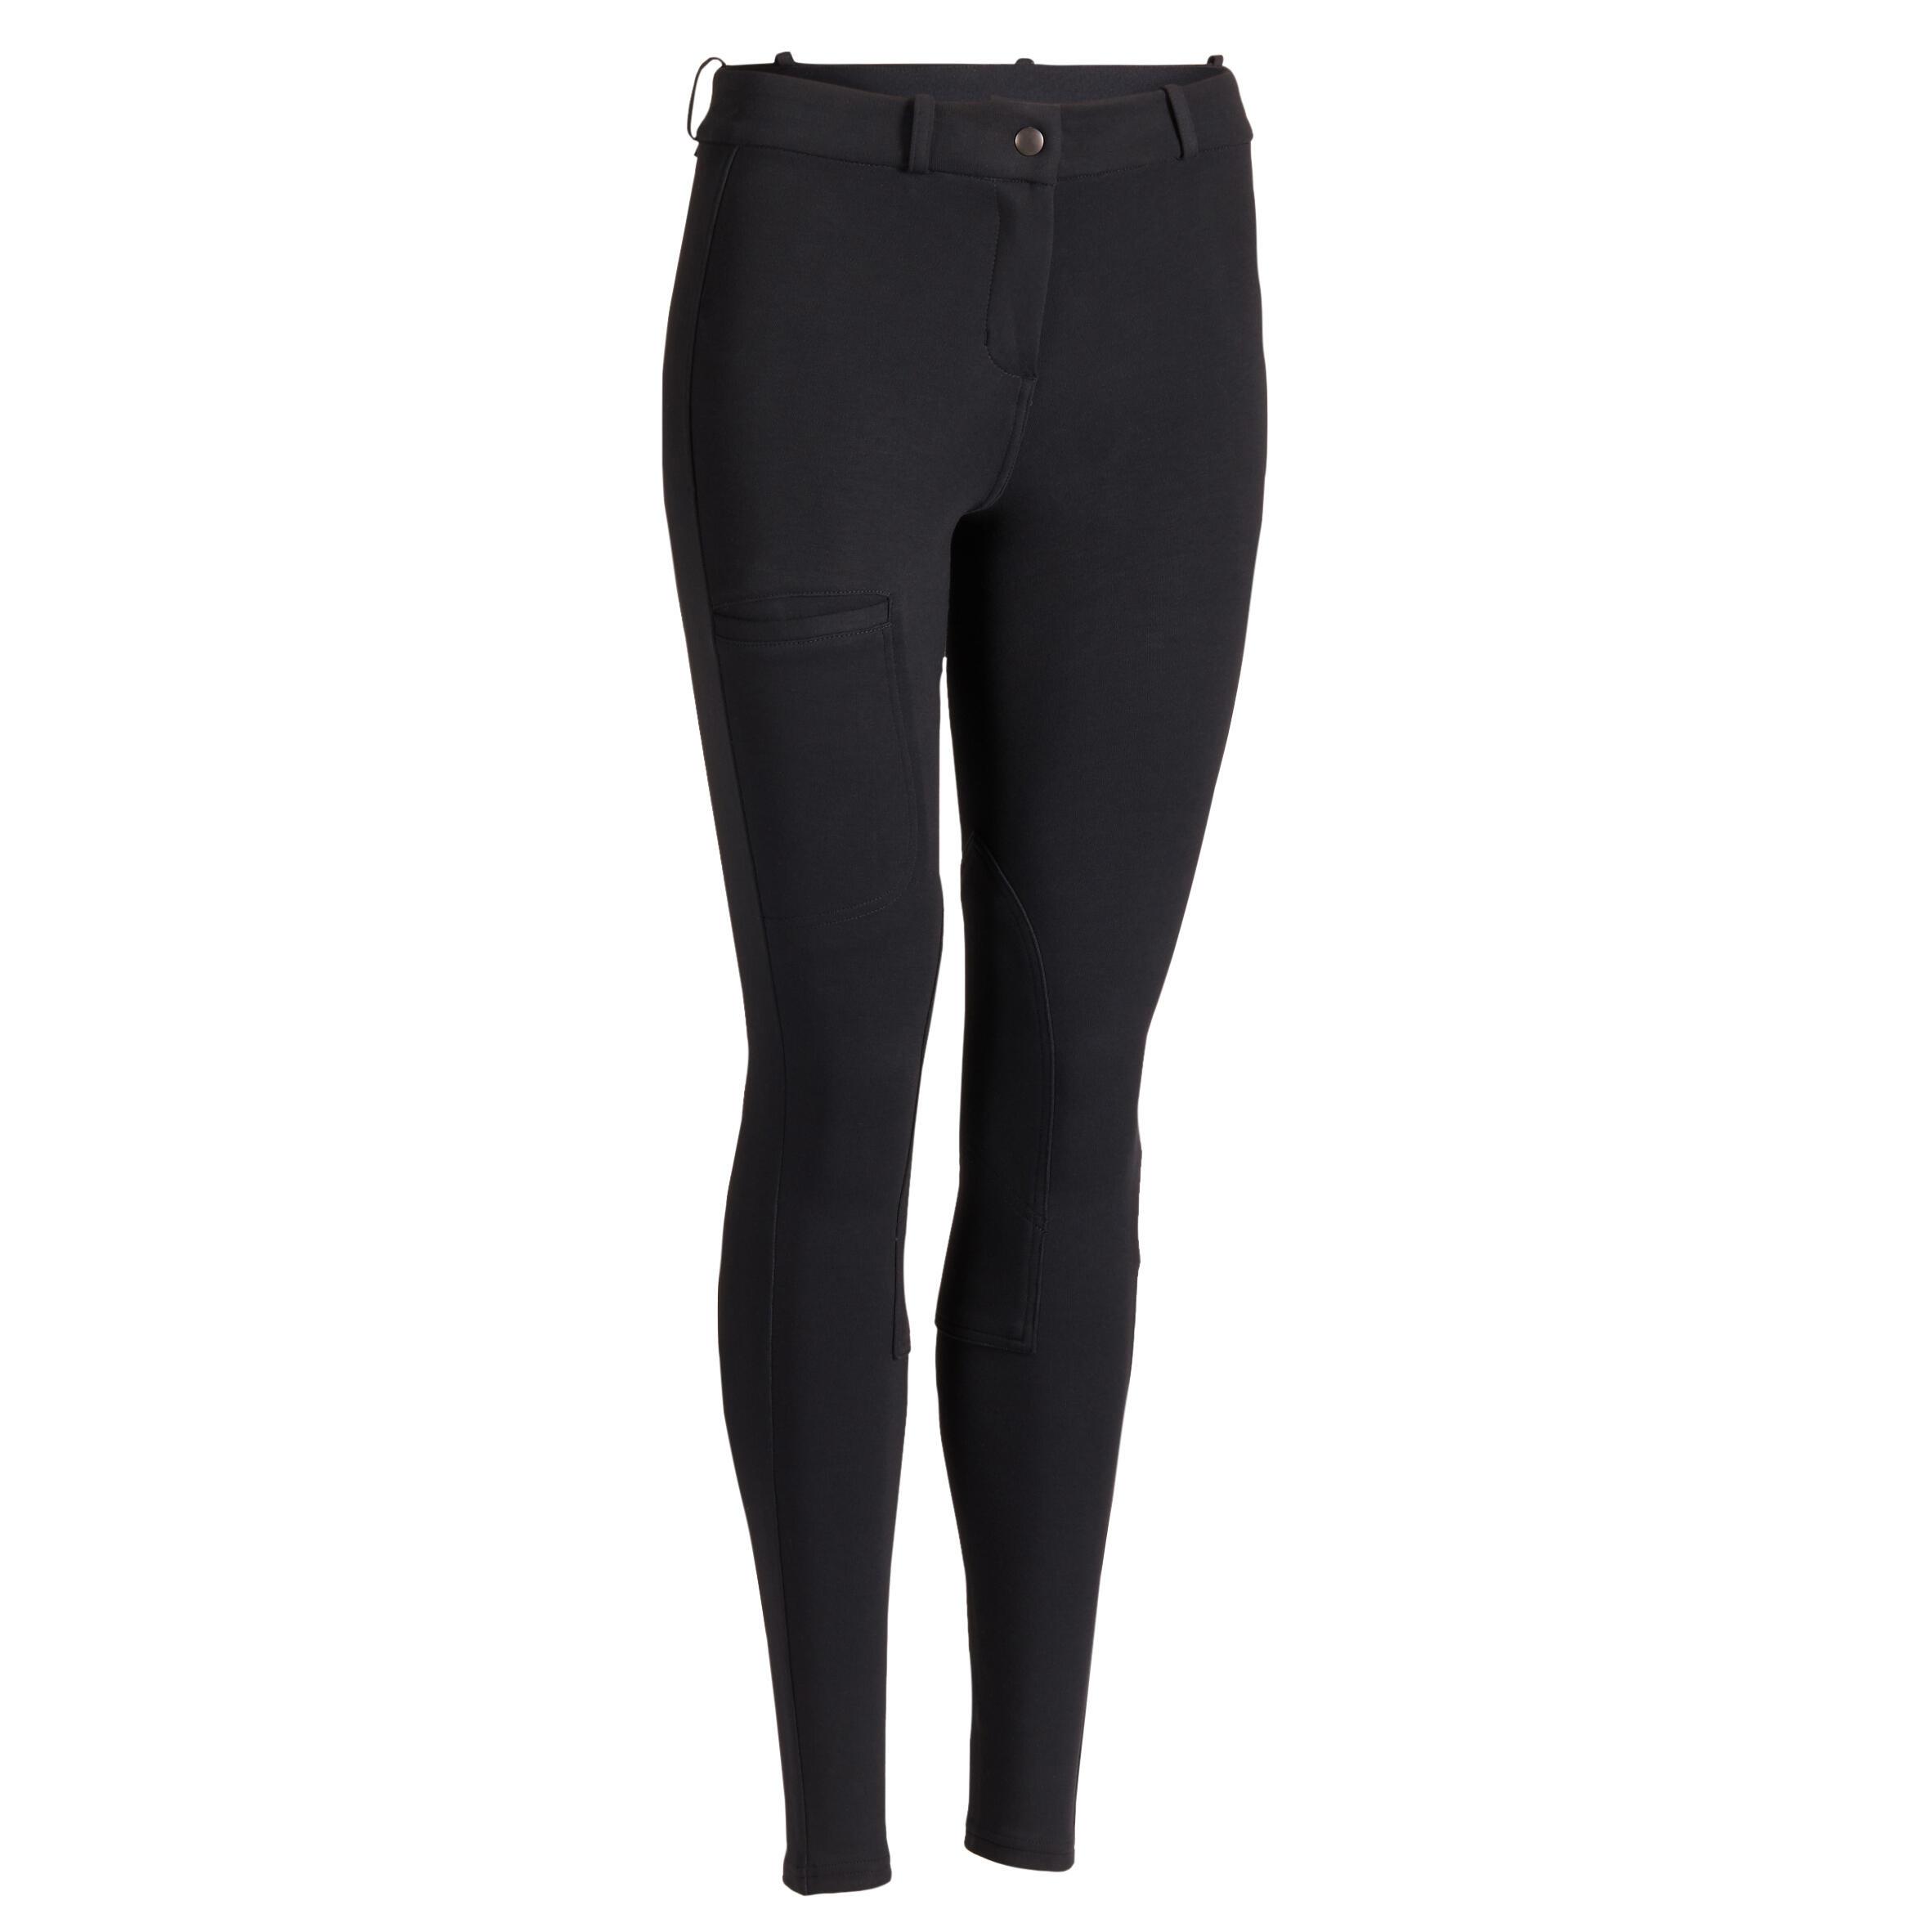 Reithose 100 Kniebesatz Damen schwarz | Sportbekleidung | Fouganza